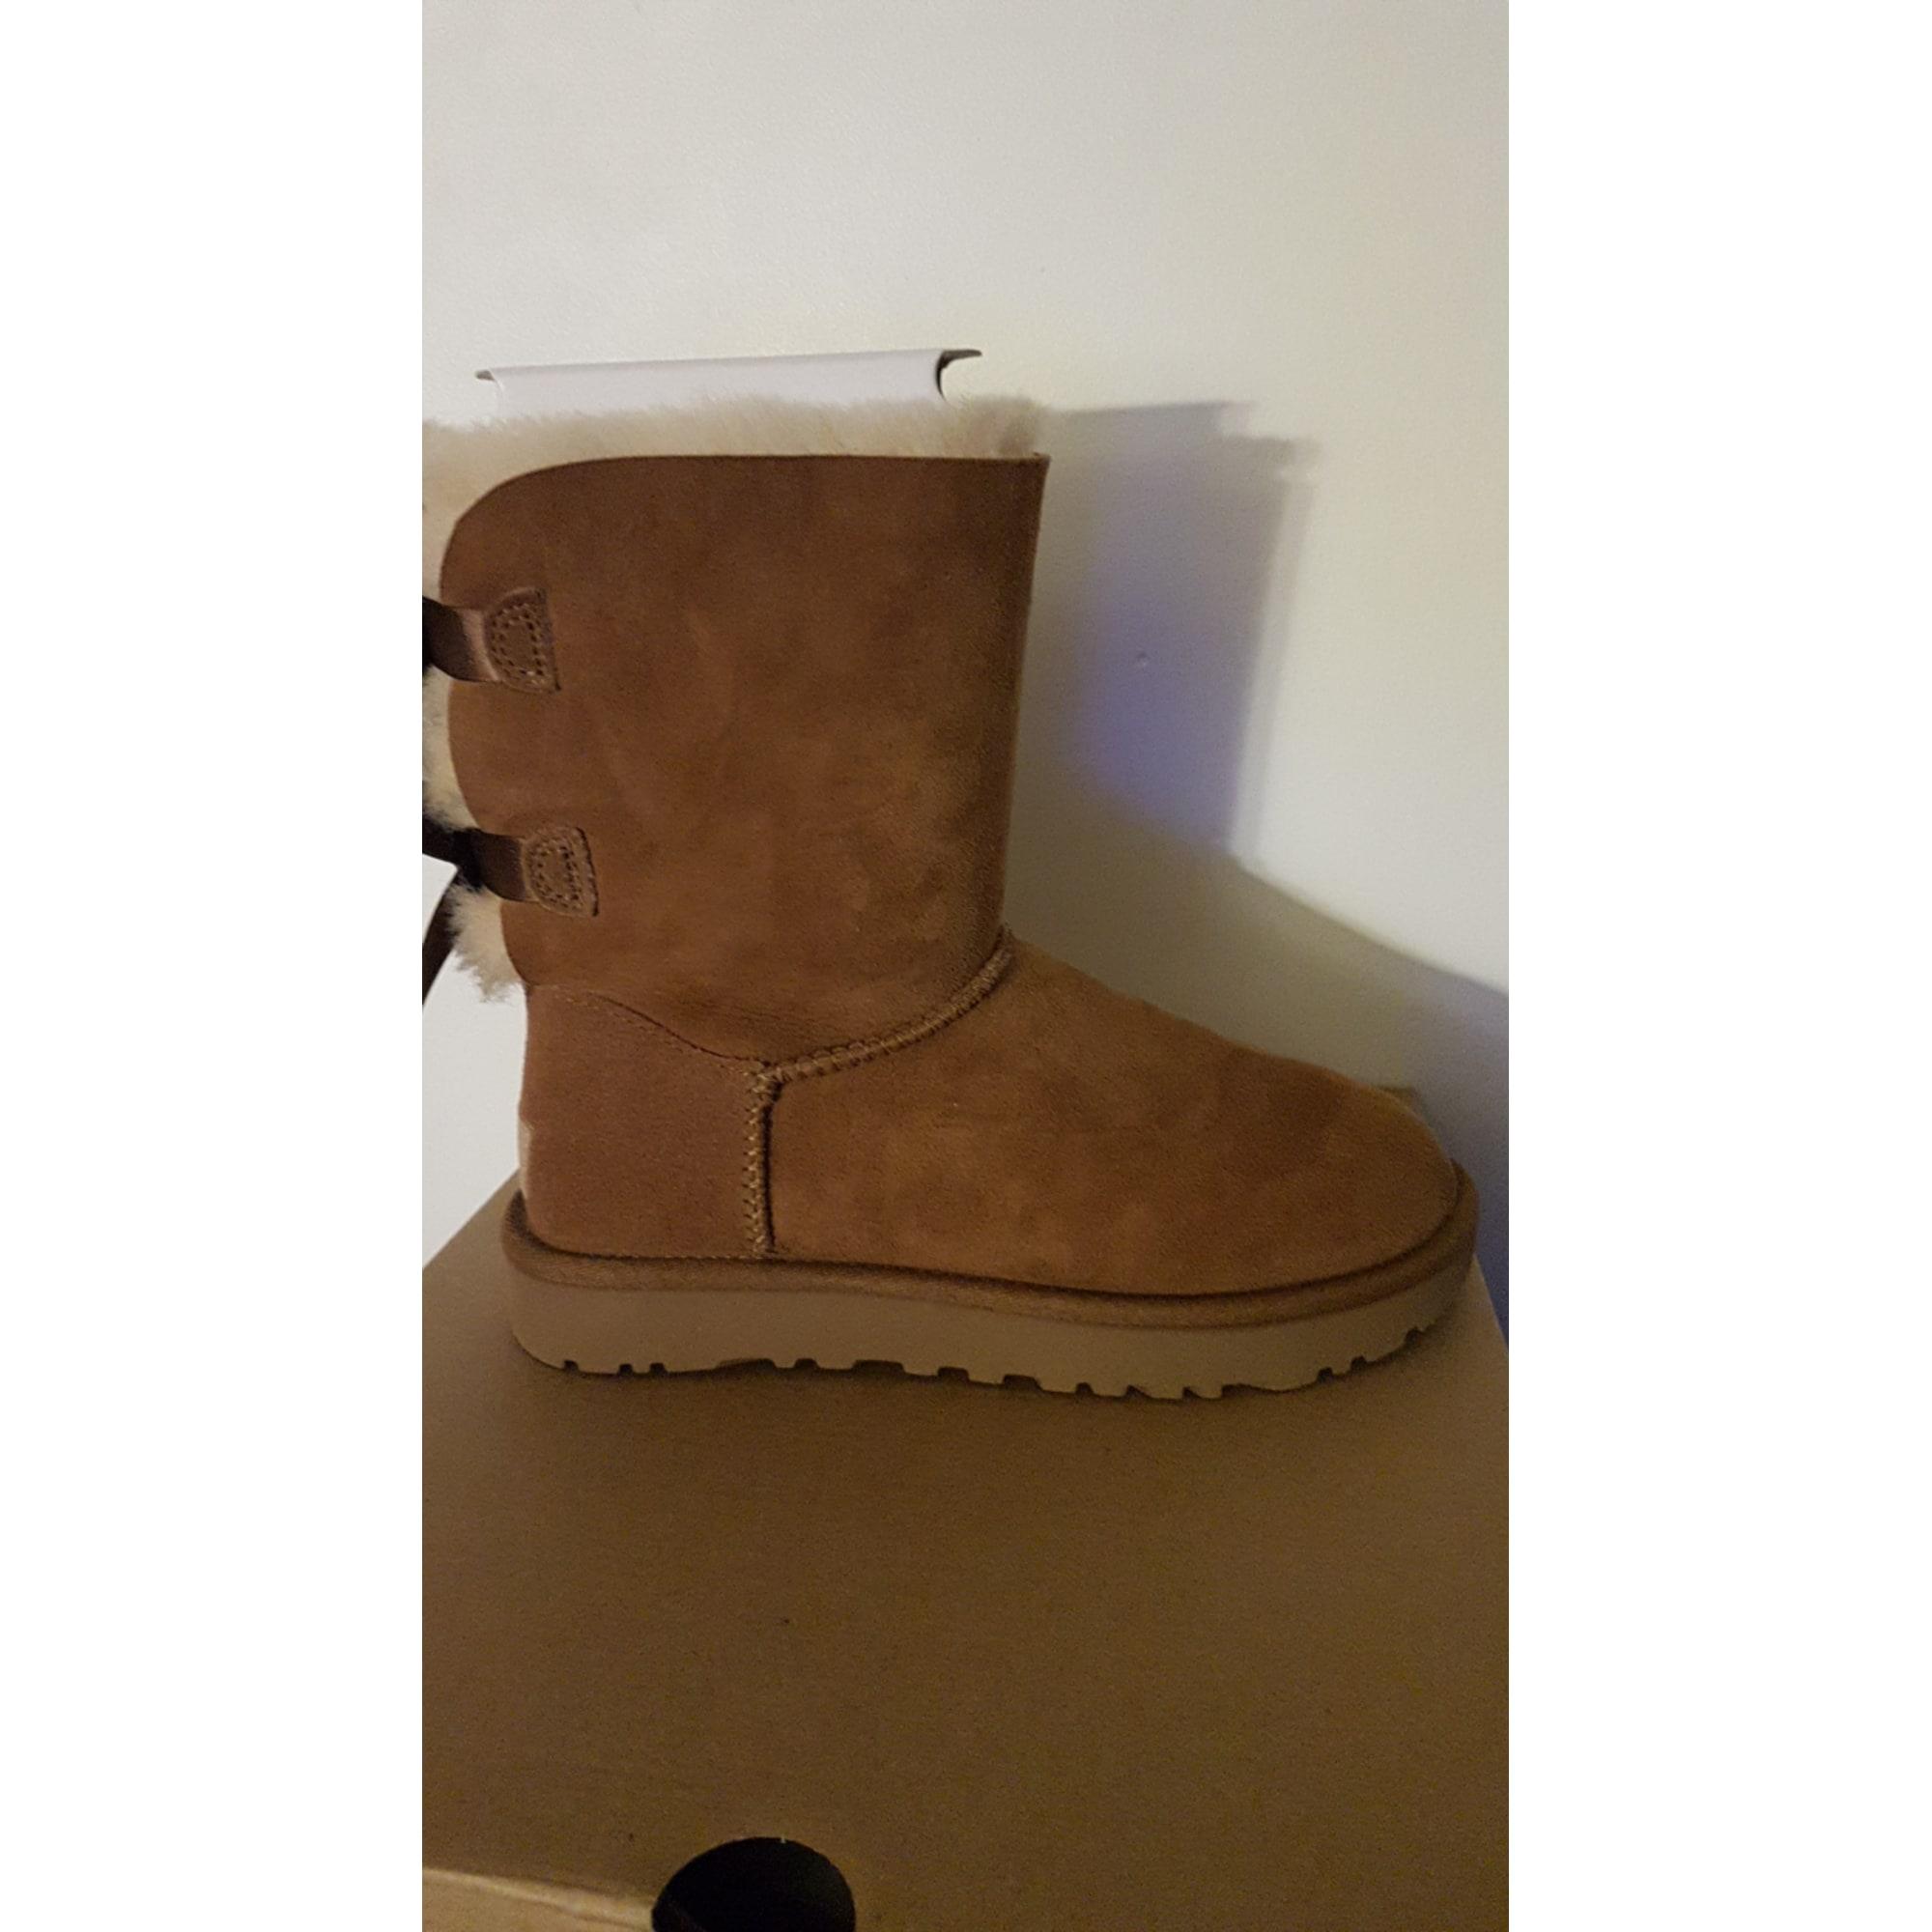 Chaussons & pantoufles UGG Beige, camel